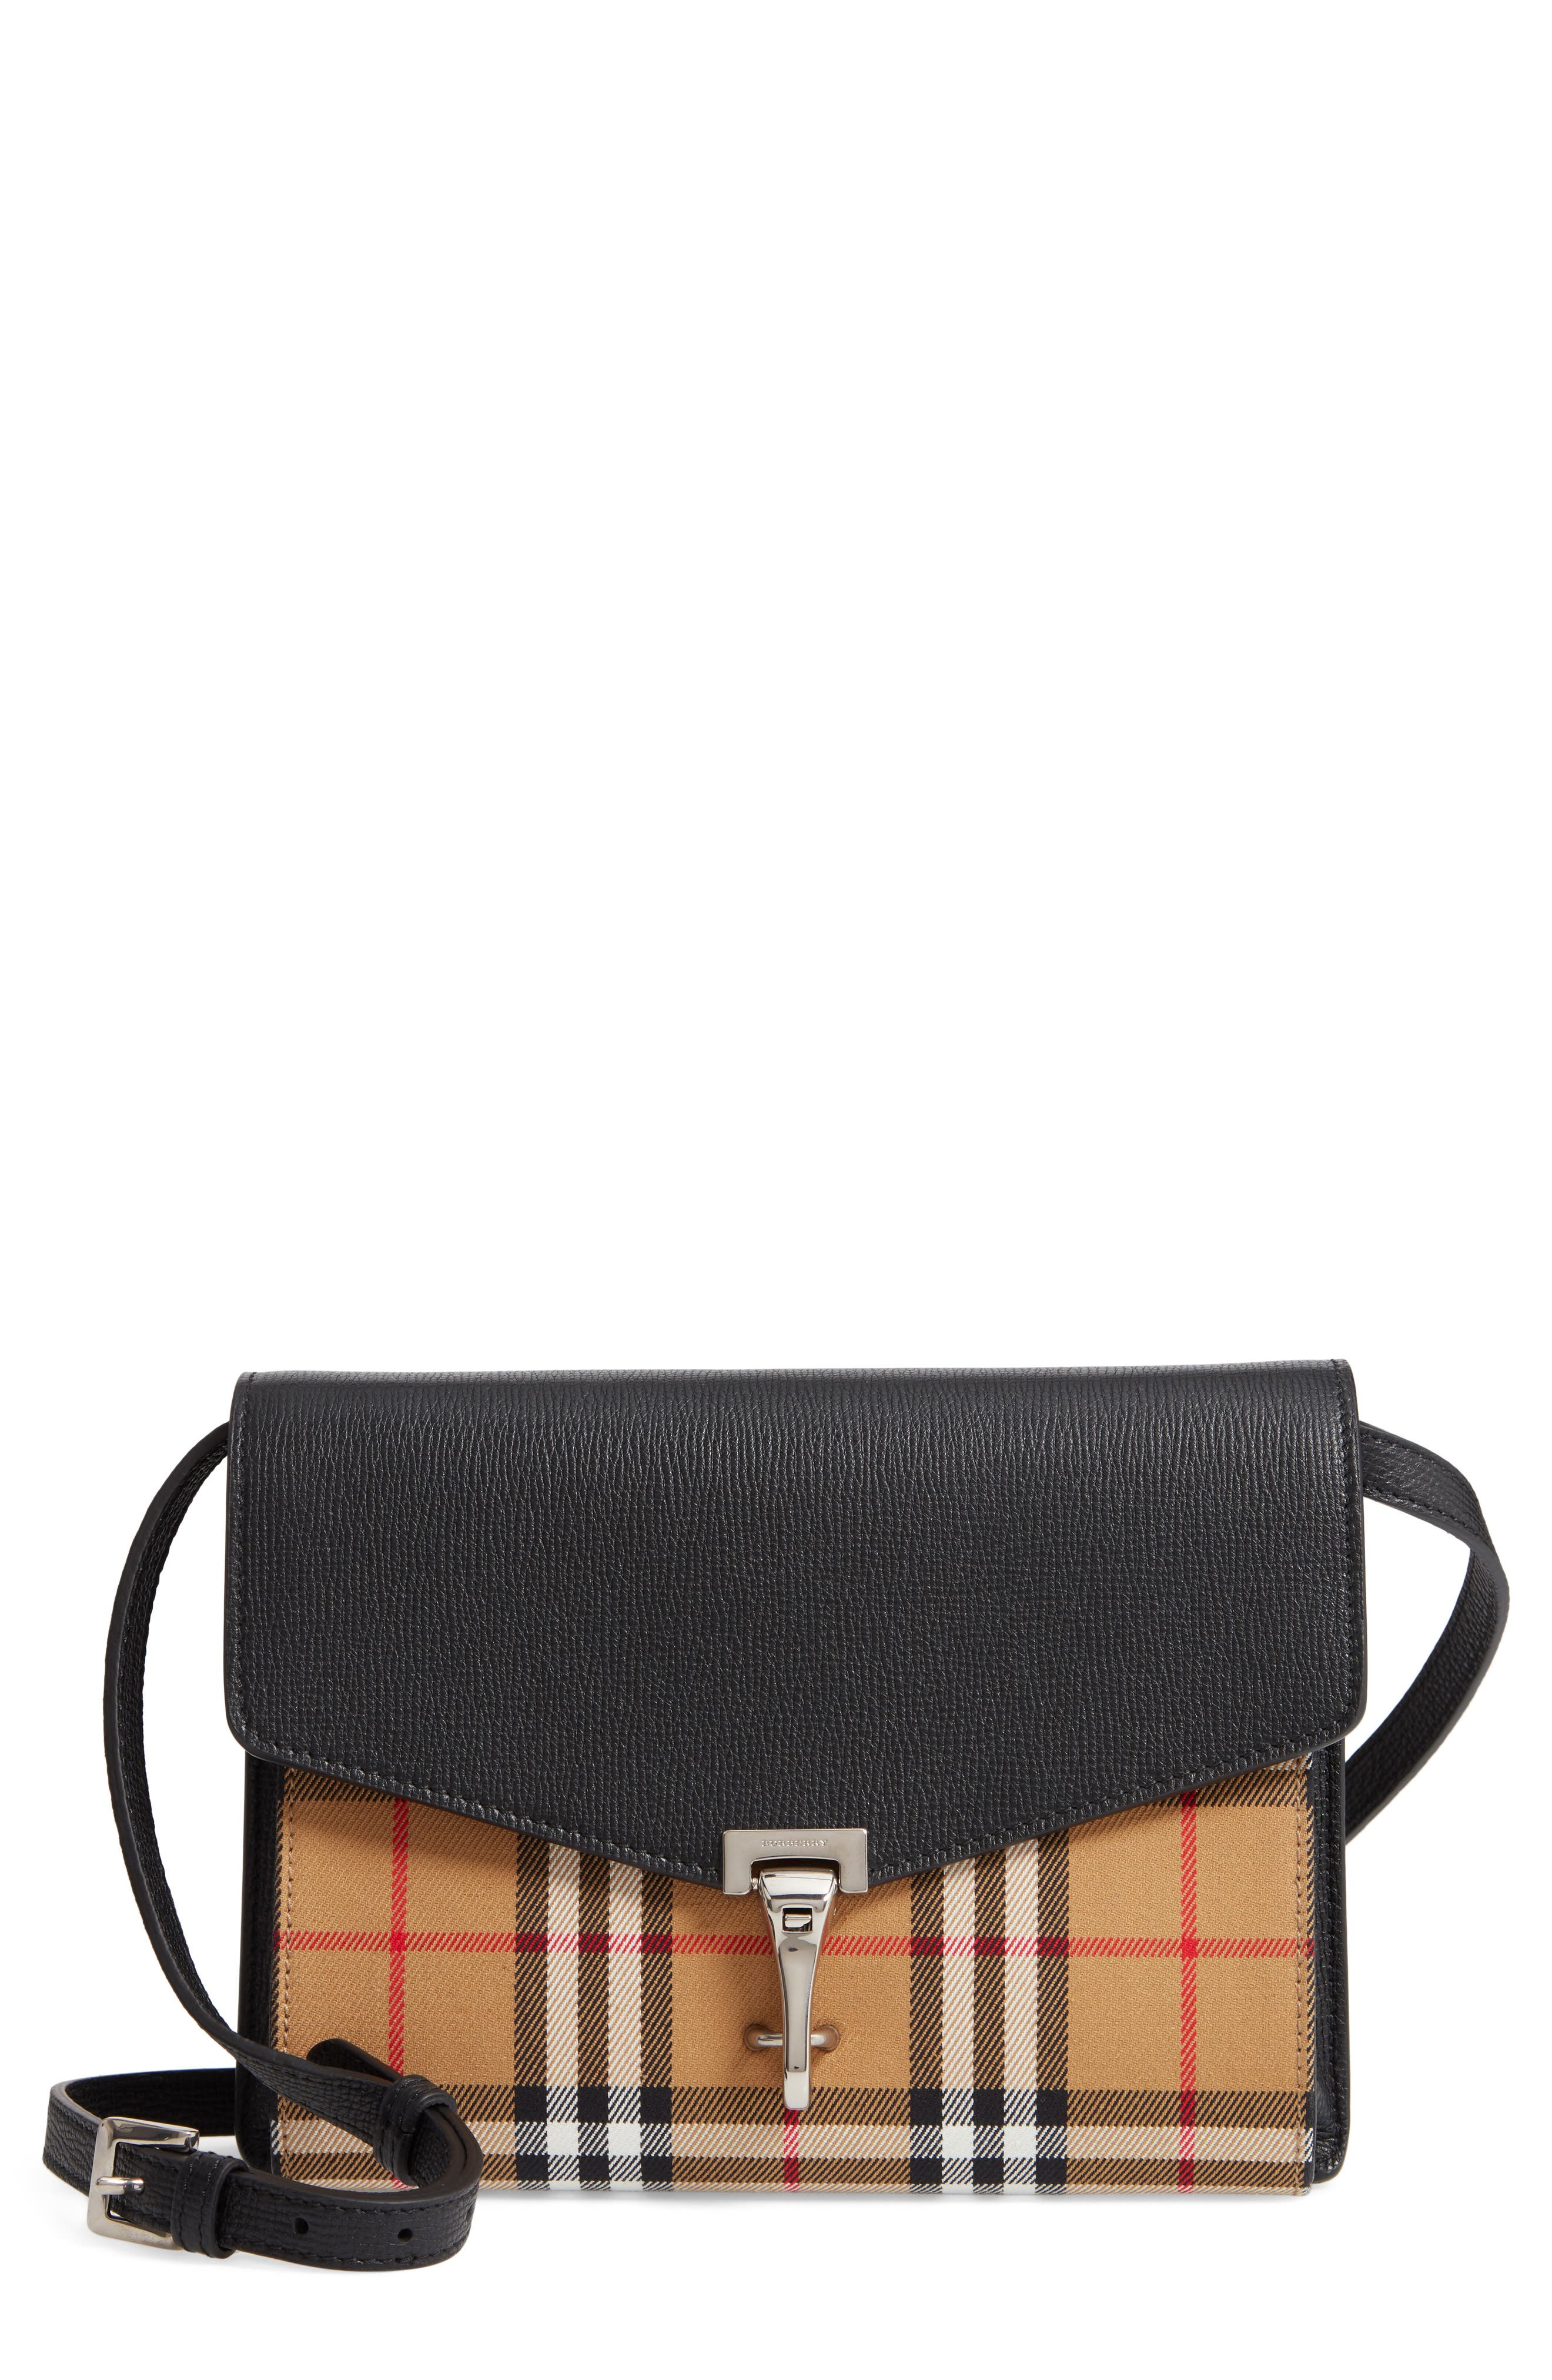 83fc78e75adc Burberry Small Macken Vintage Check Crossbody Bag - Black